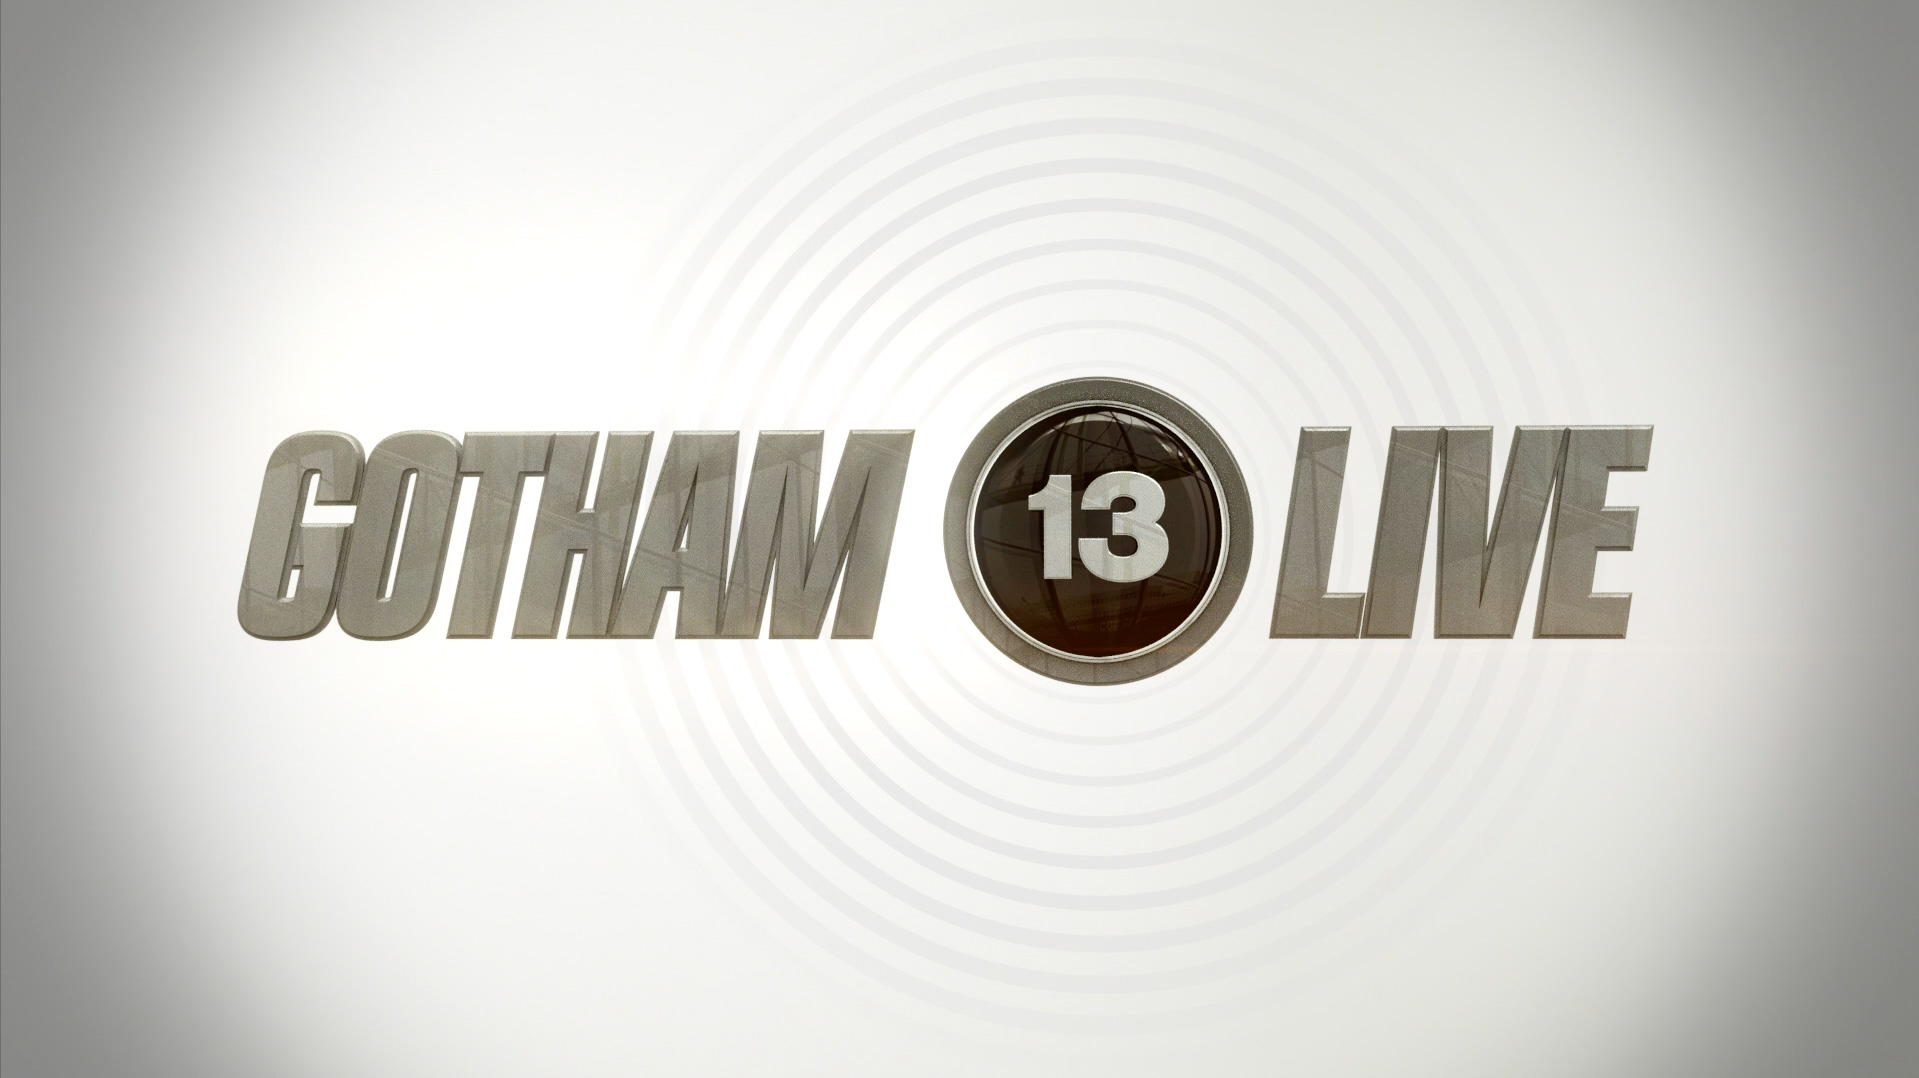 gotham13